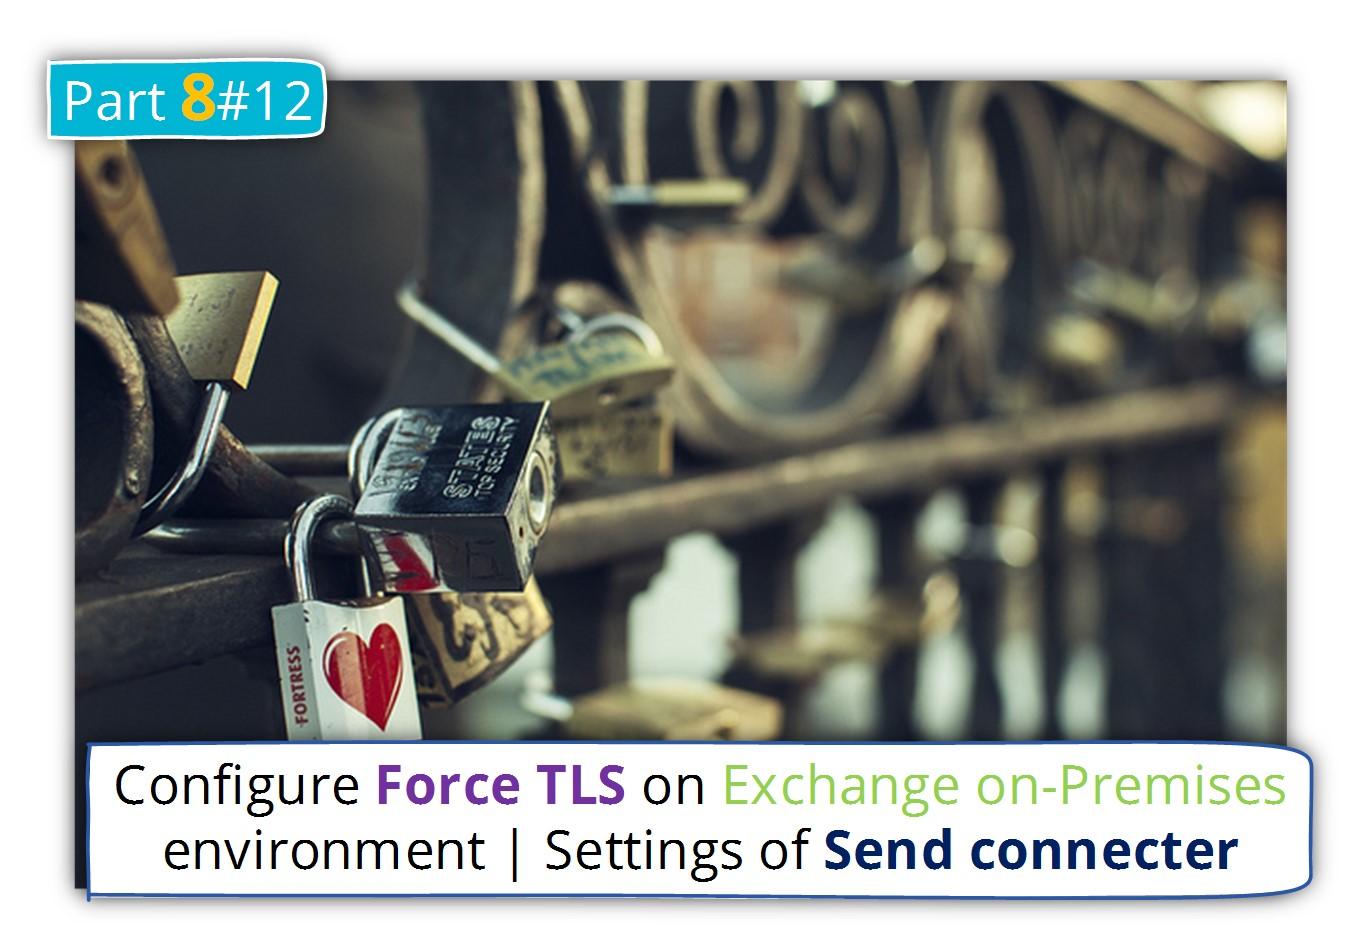 Configure Force TLS on Exchange on-Premises environment